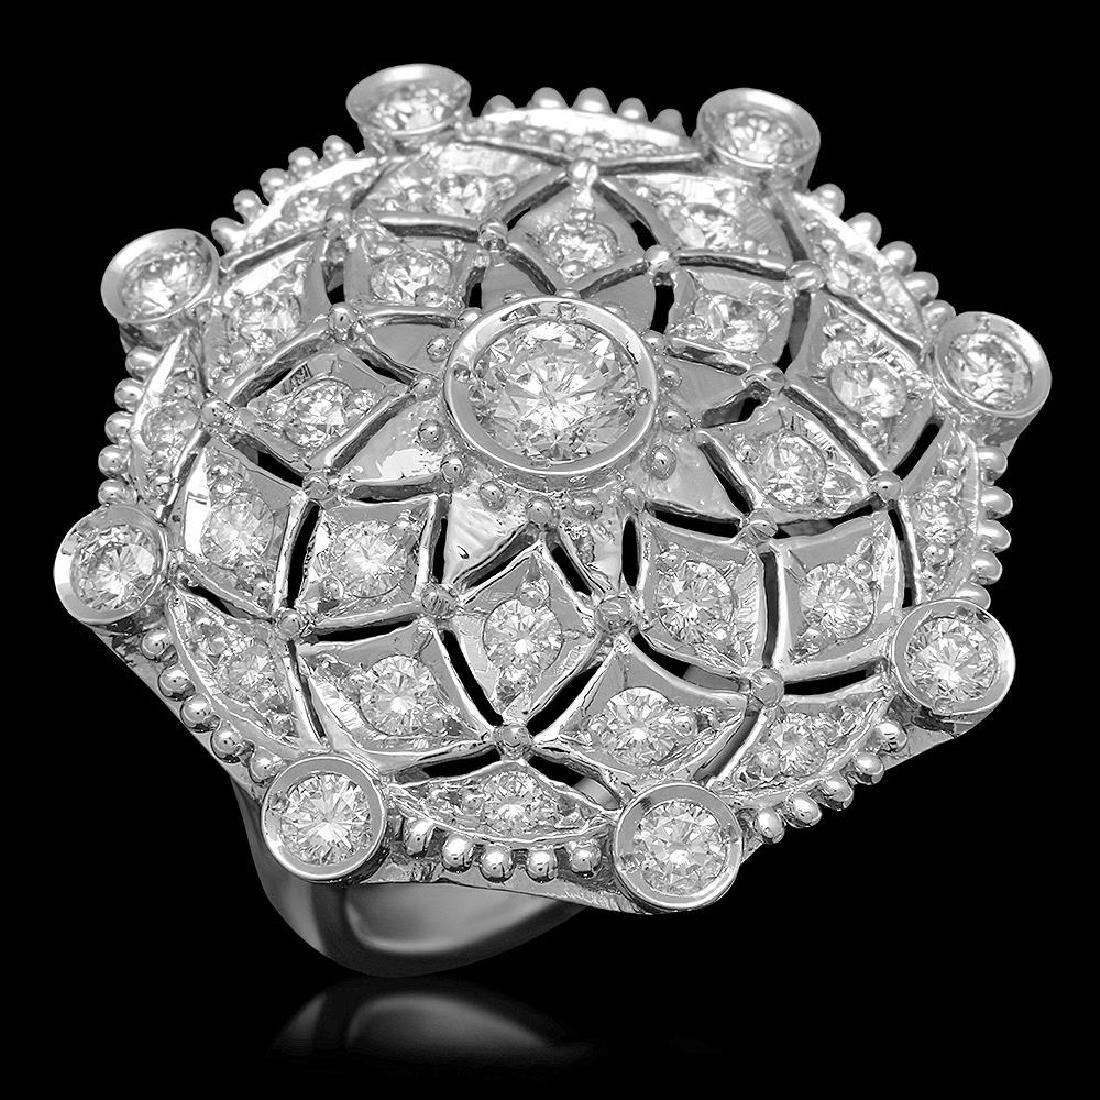 14K Gold 1.96ct Diamond Ring